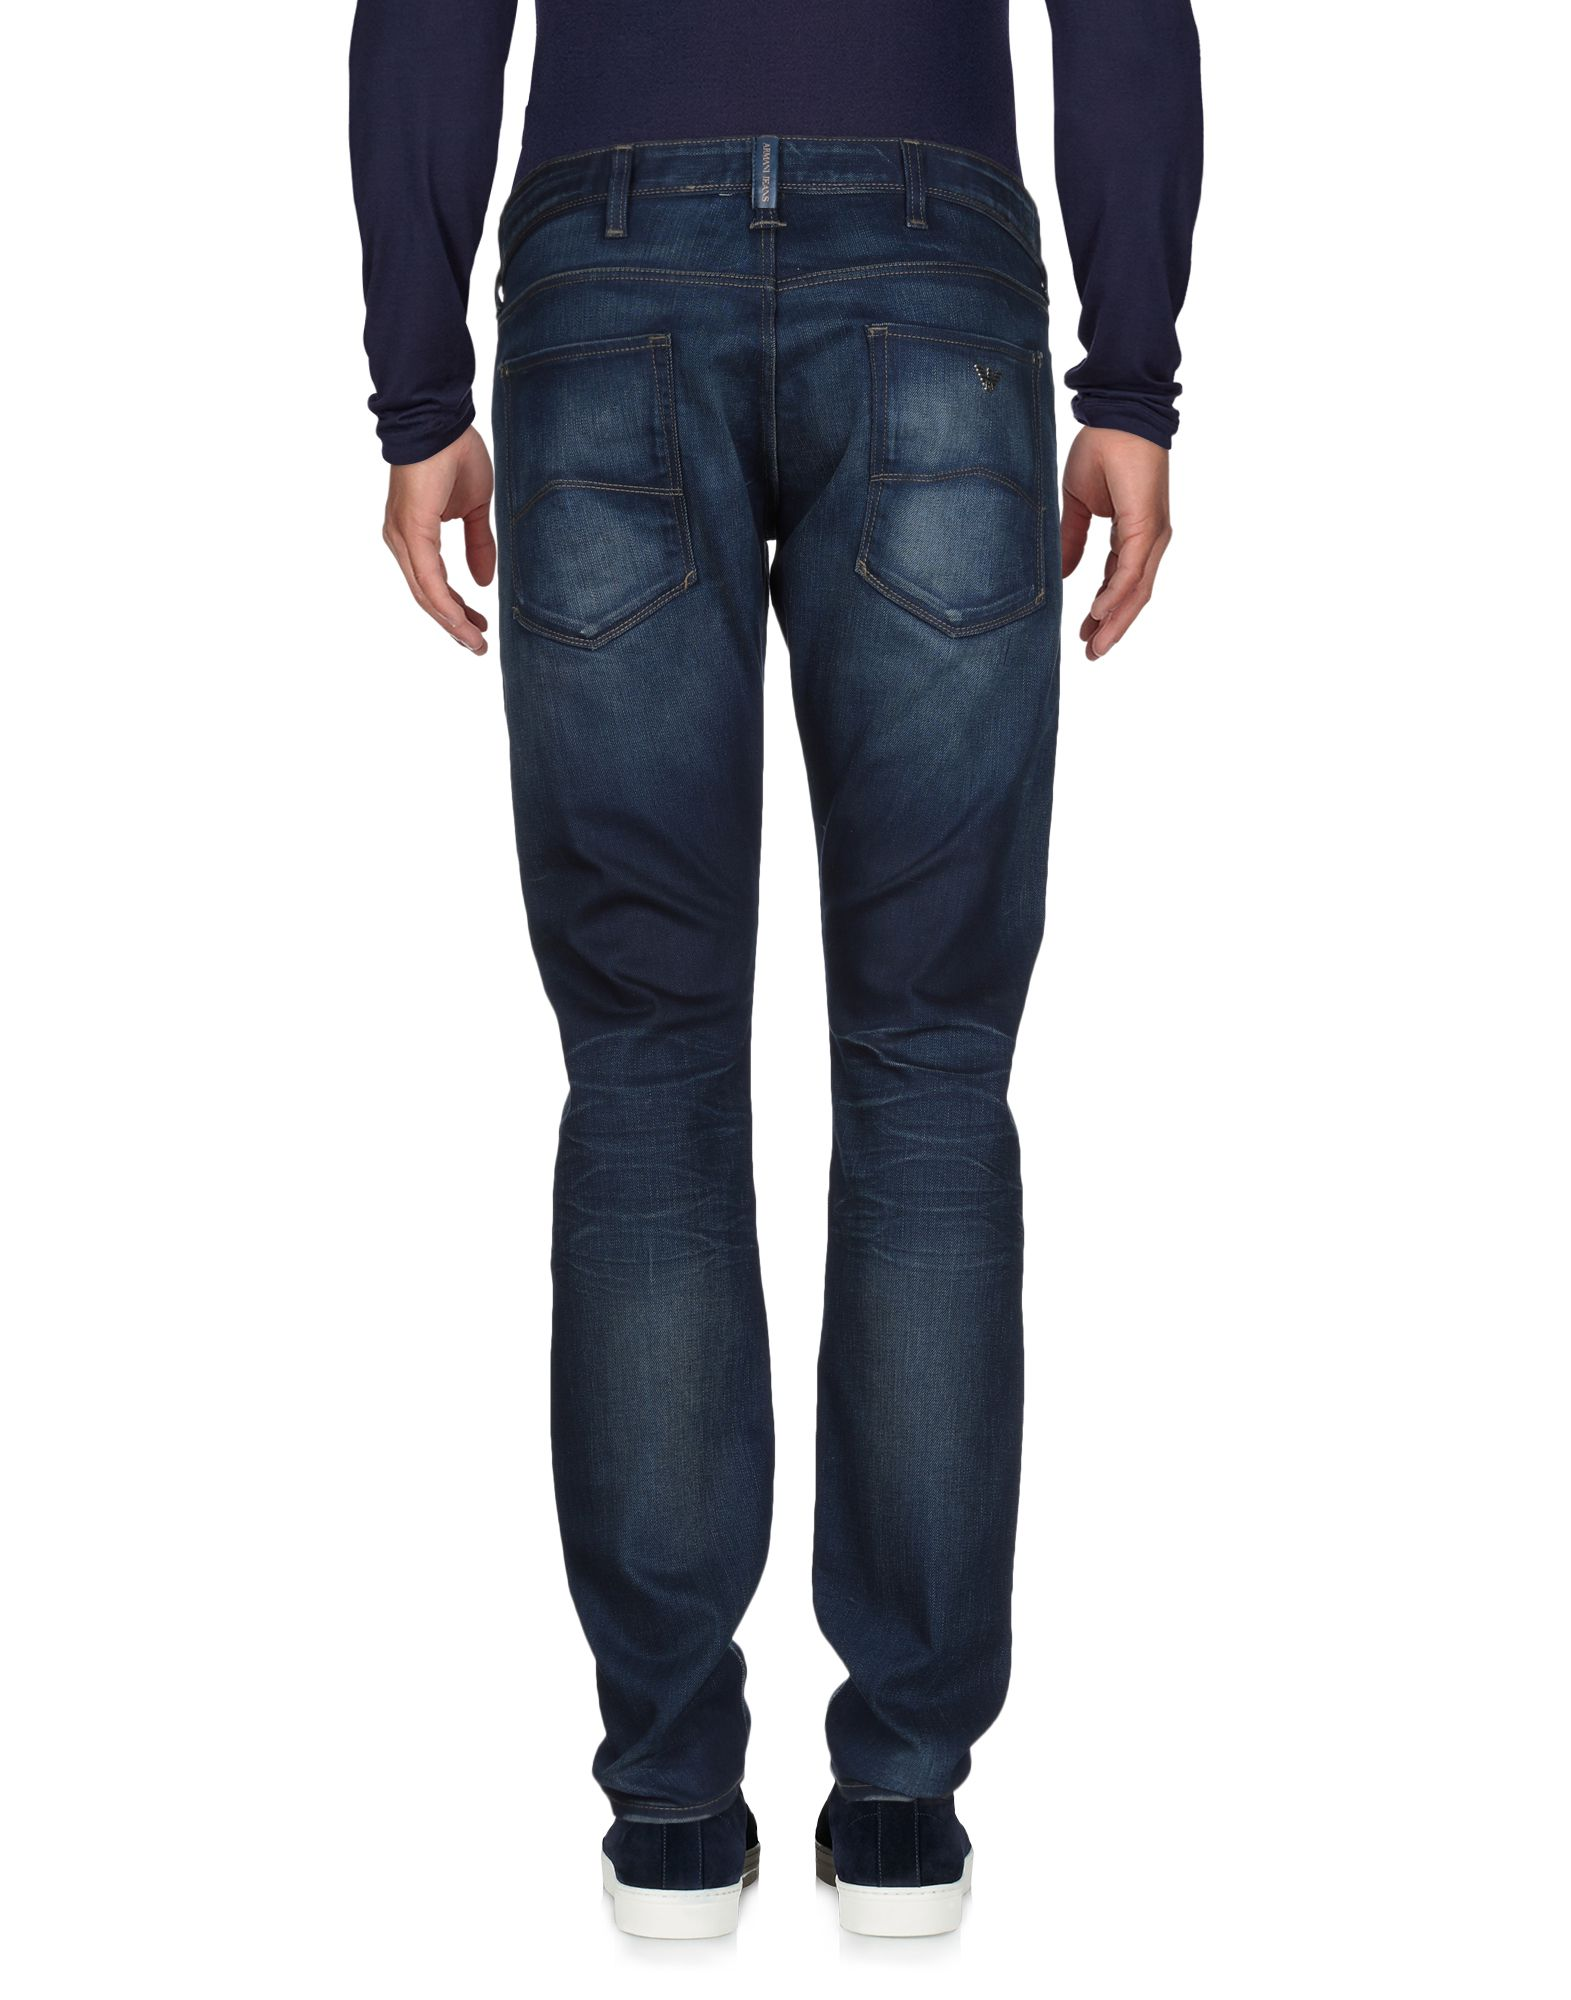 Pantaloni Jeans Armani Uomo Jeans Uomo Armani - 42686114HQ 9b64bb